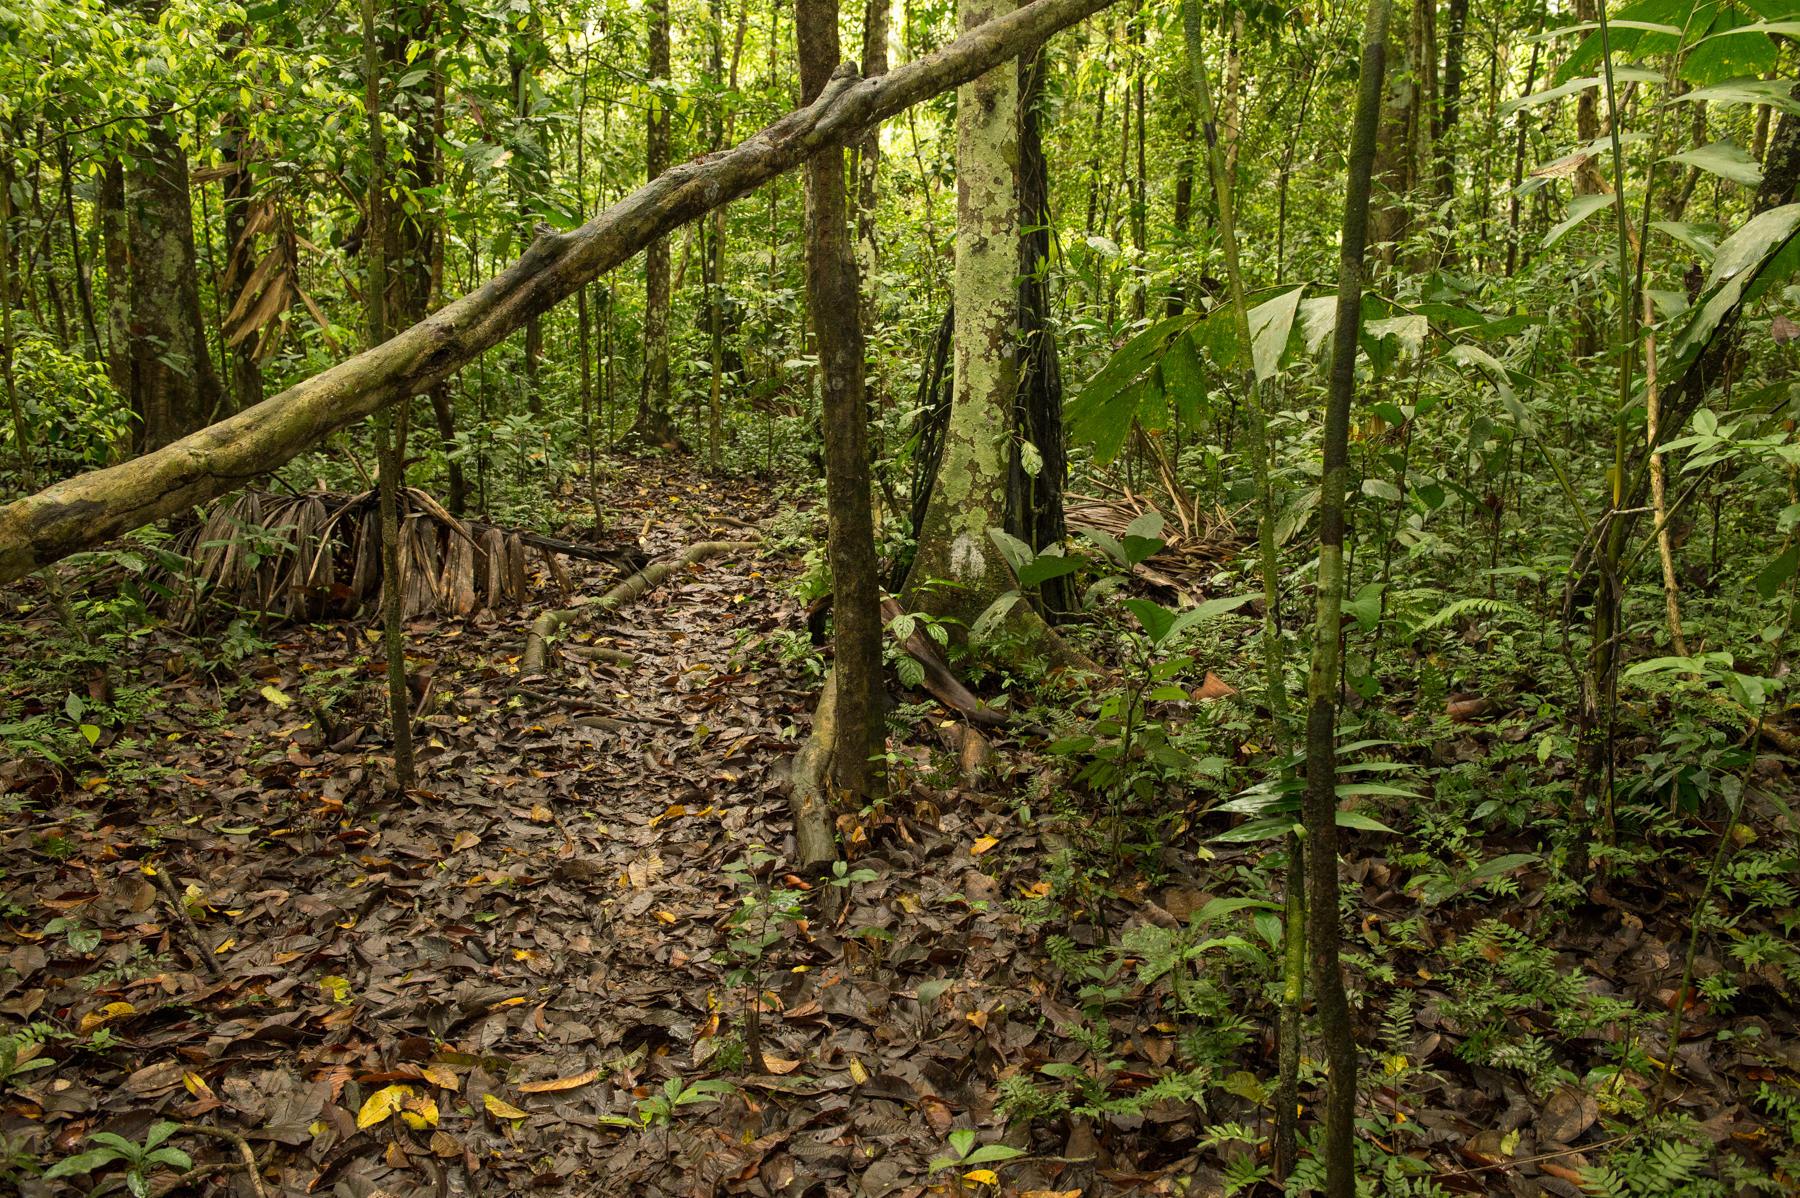 plants, trees, forest floor, rainforest